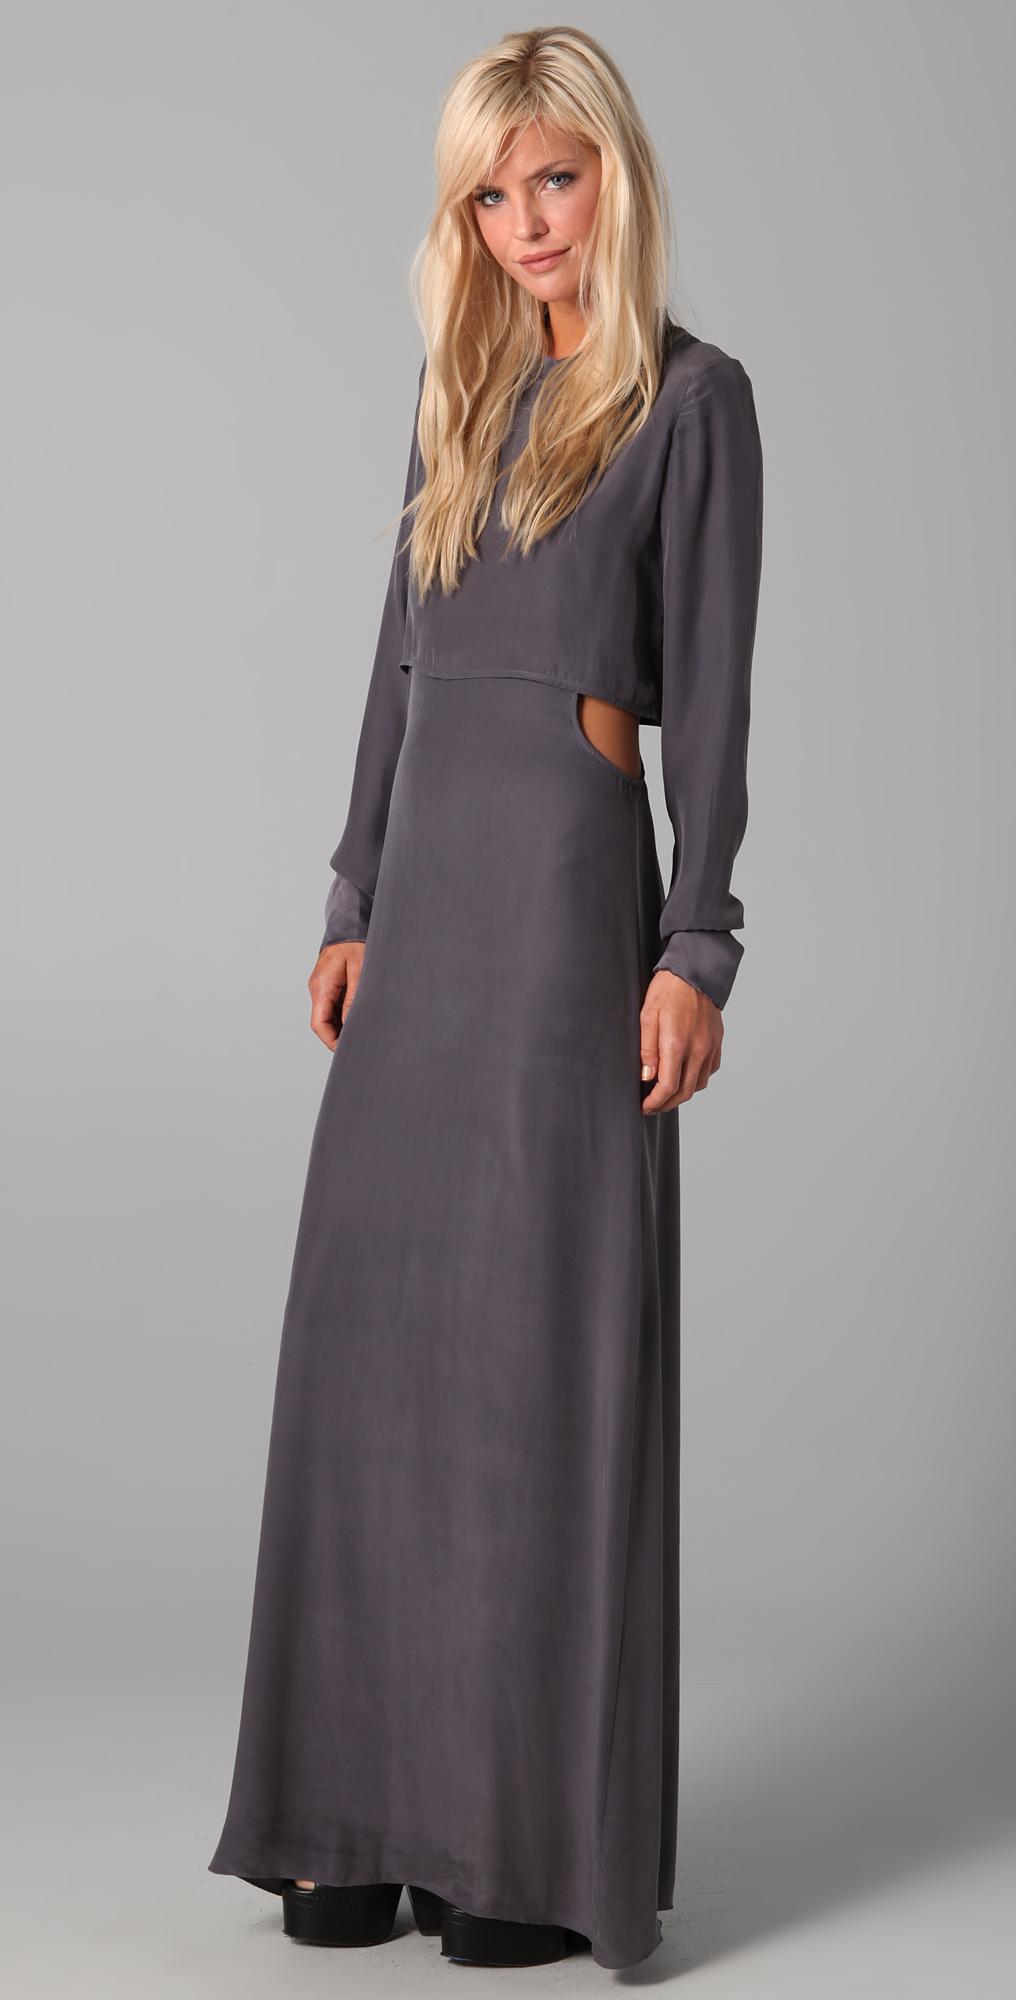 ffd11c154d59a Pencey Side Cut Maxi Dress on PopScreen